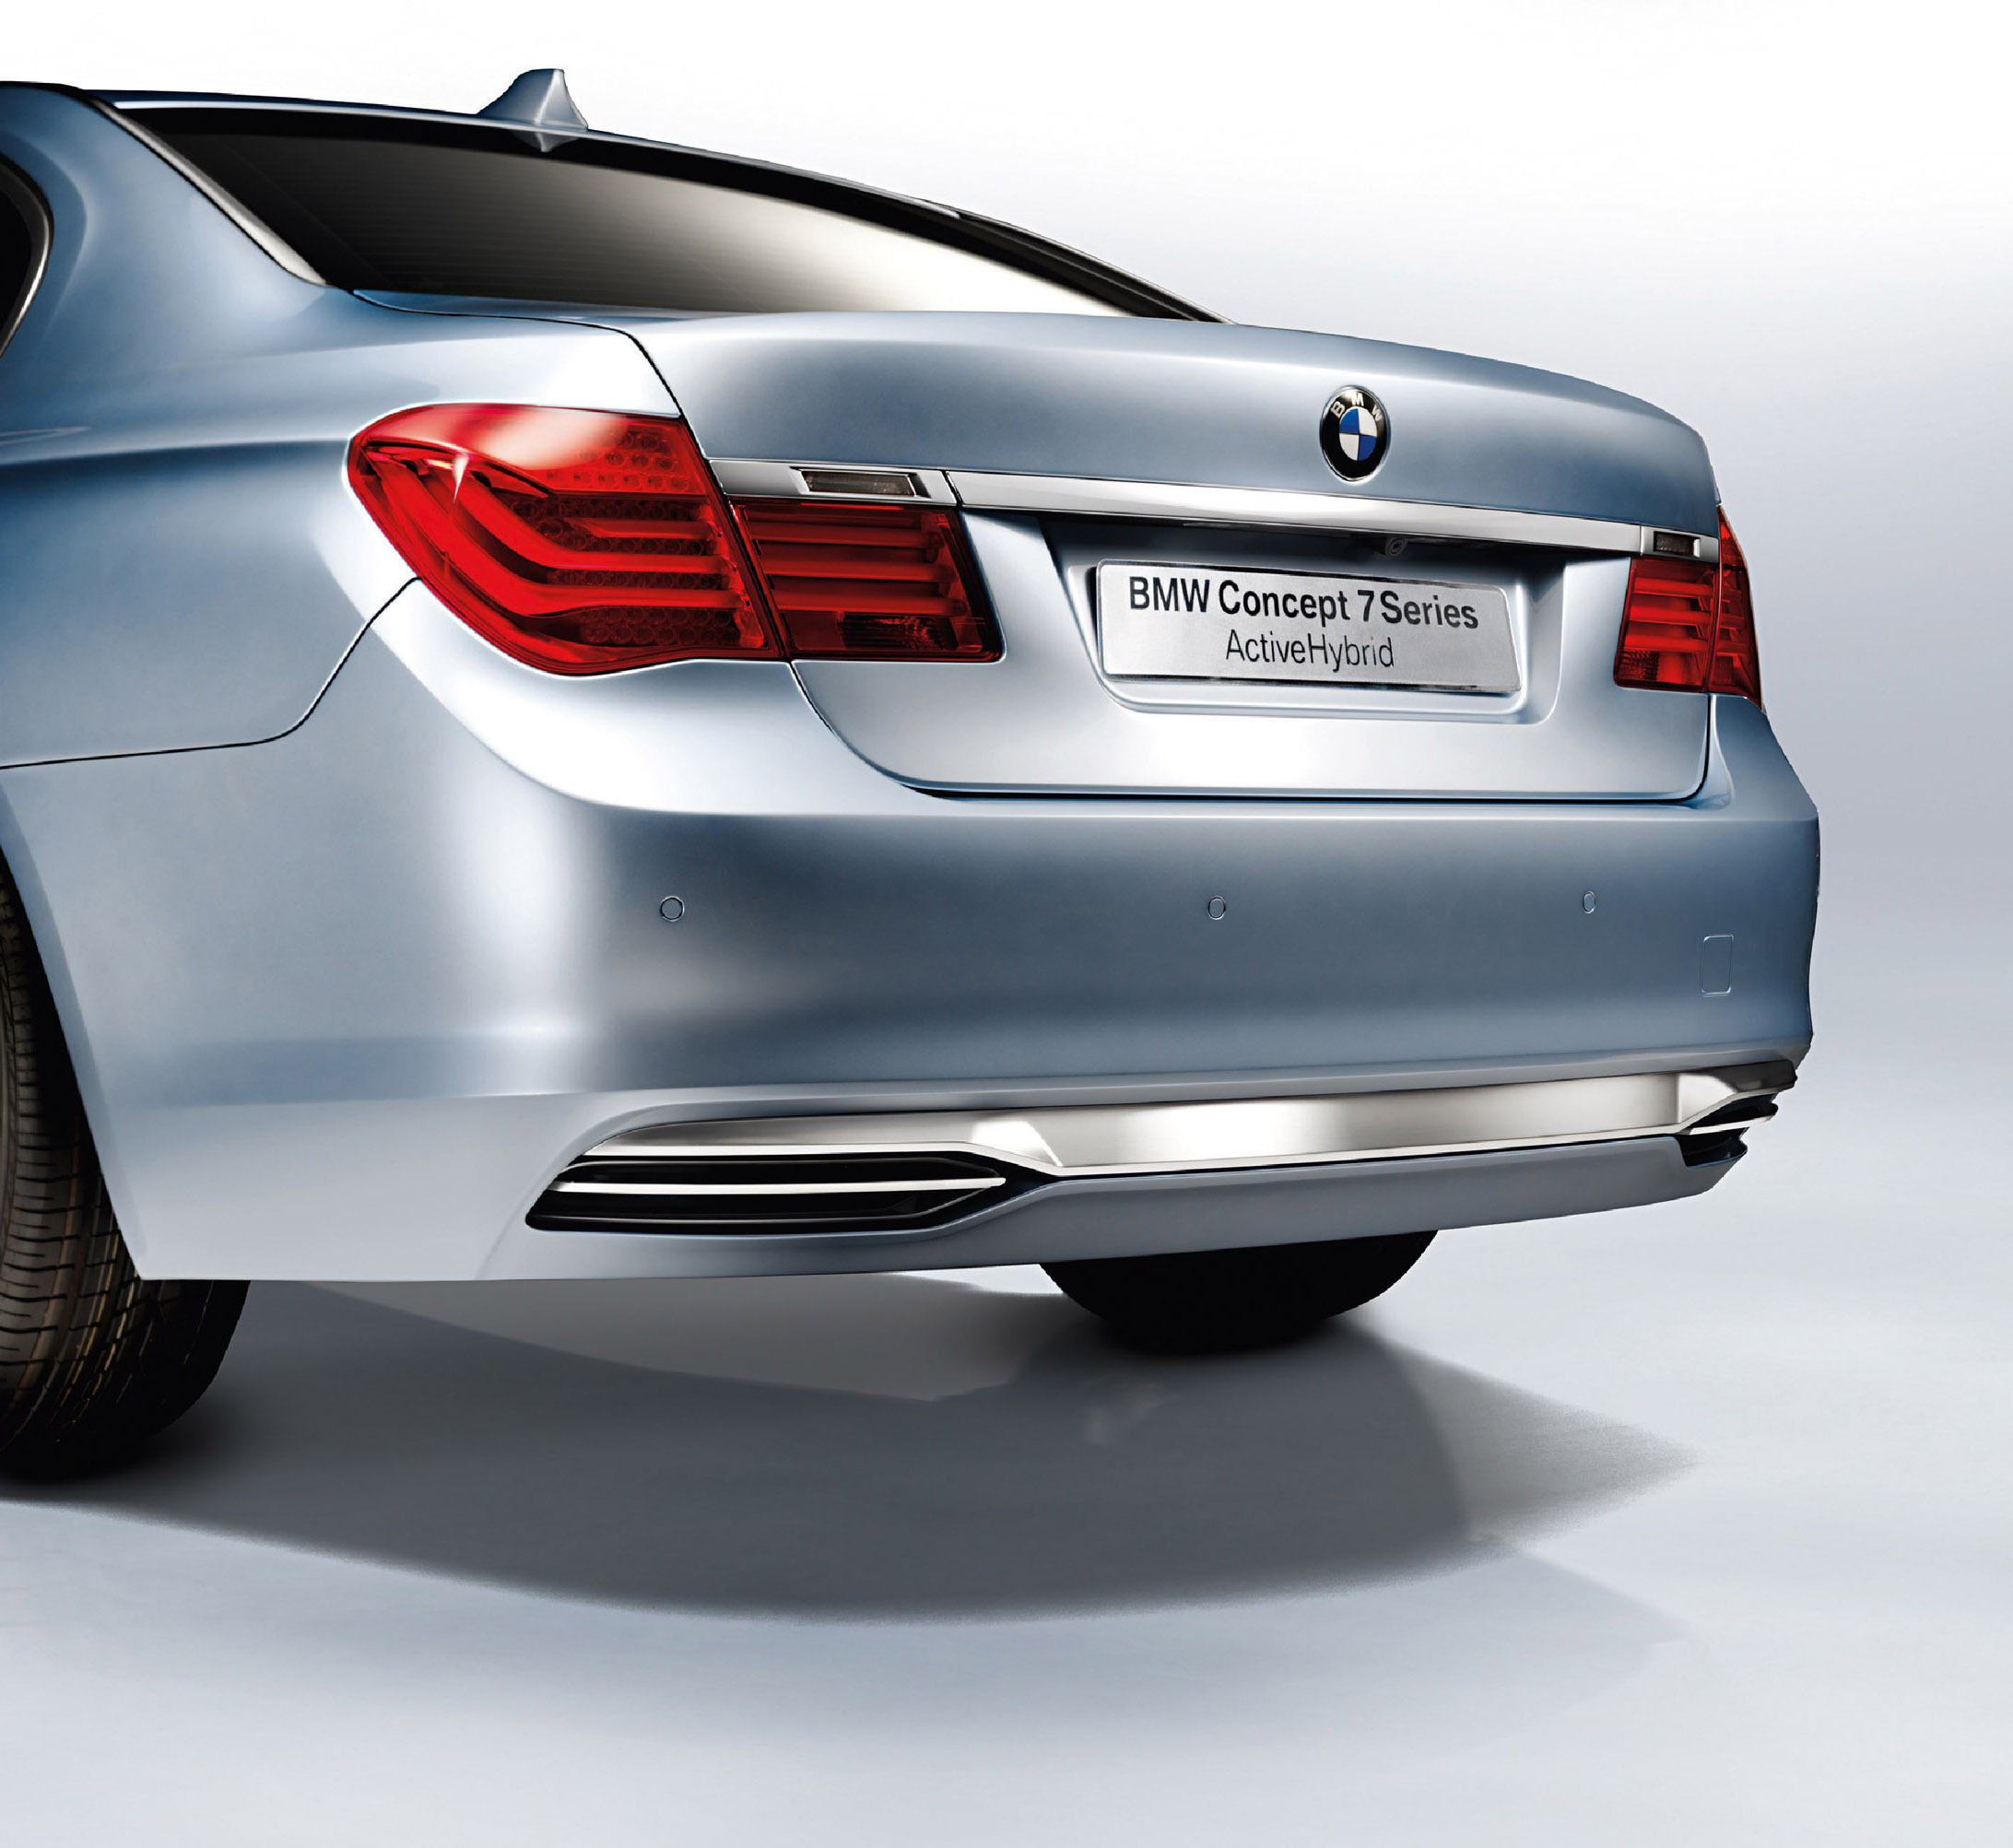 The BMW Concept 7 Series ActiveHybrid